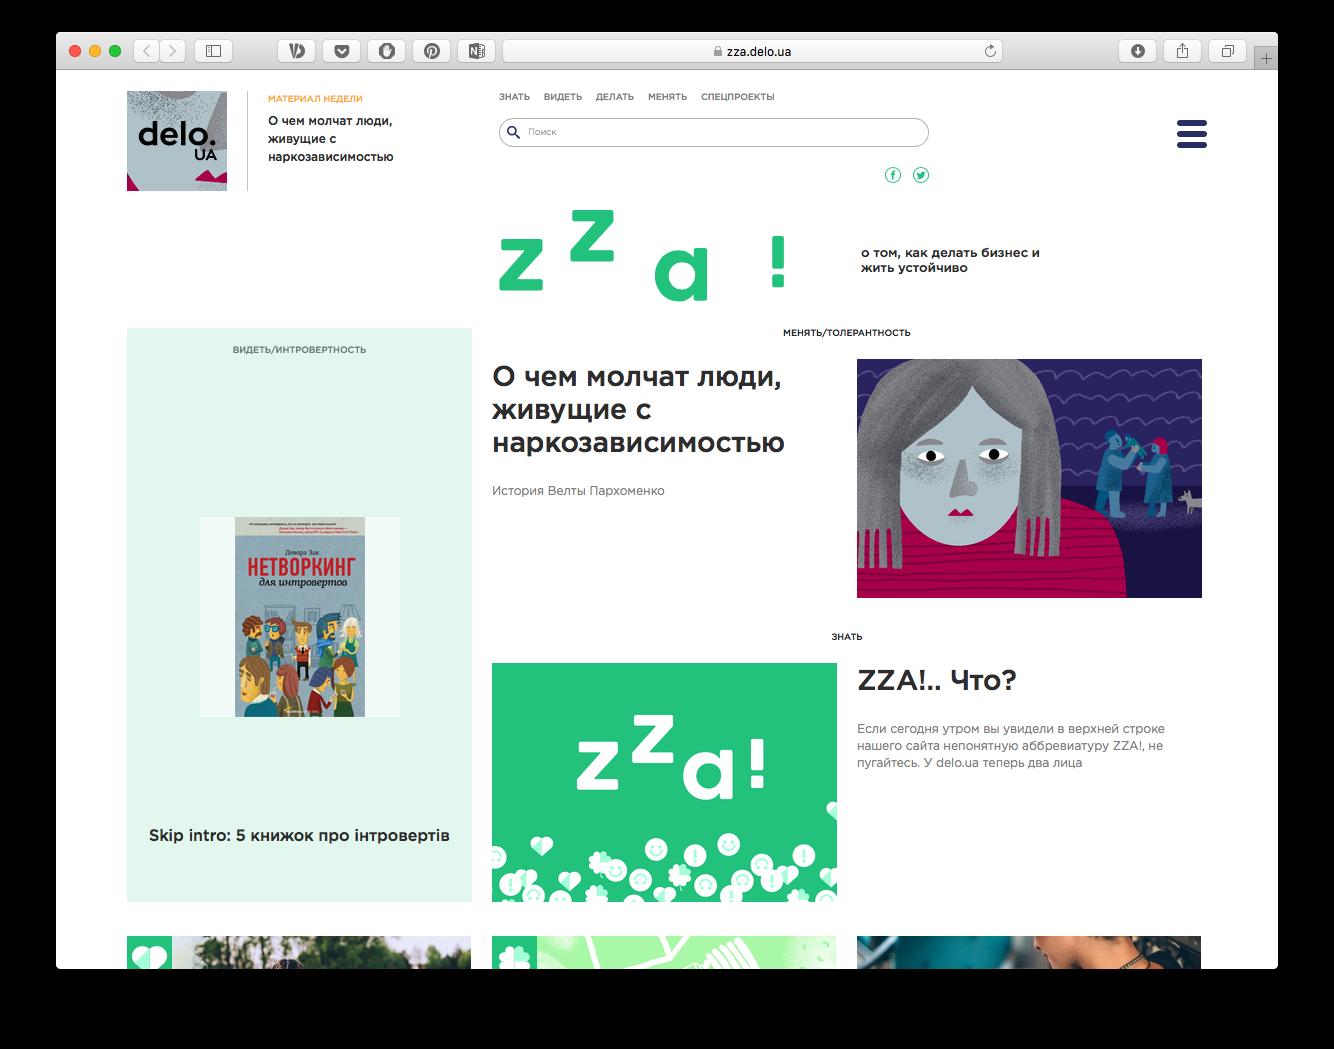 Vydannja Delo.ua zapuskaje lajfstajl-naprjamok z orijentacijeju na «pokolinnja Z»